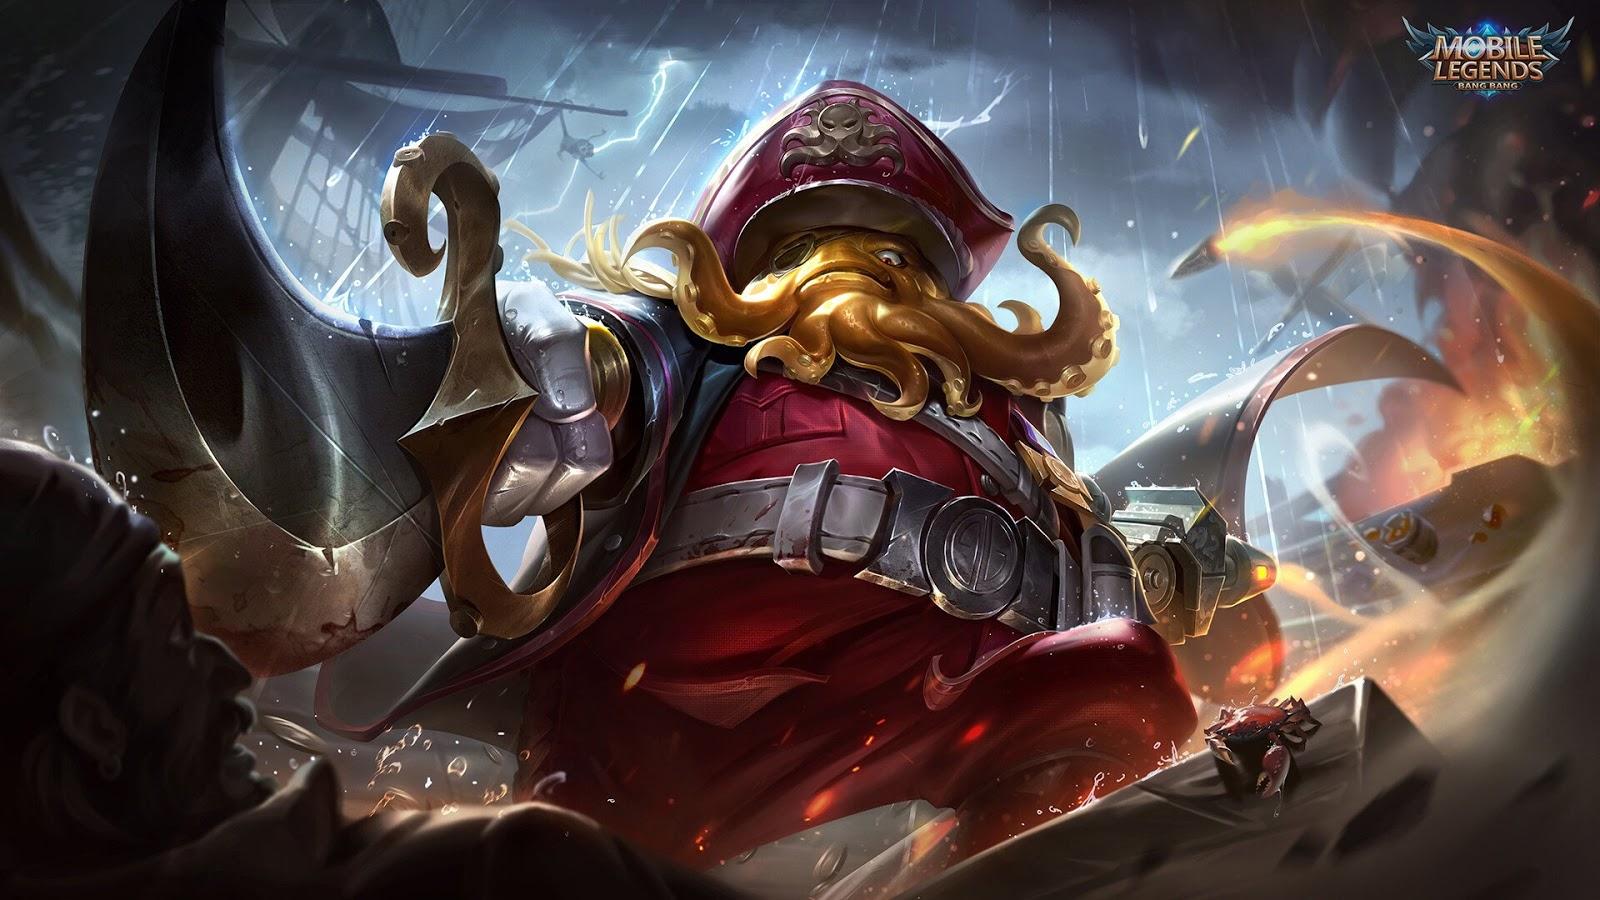 Wallpaper Bane Warlord Season 11 Mobile Legends Full HD for PC